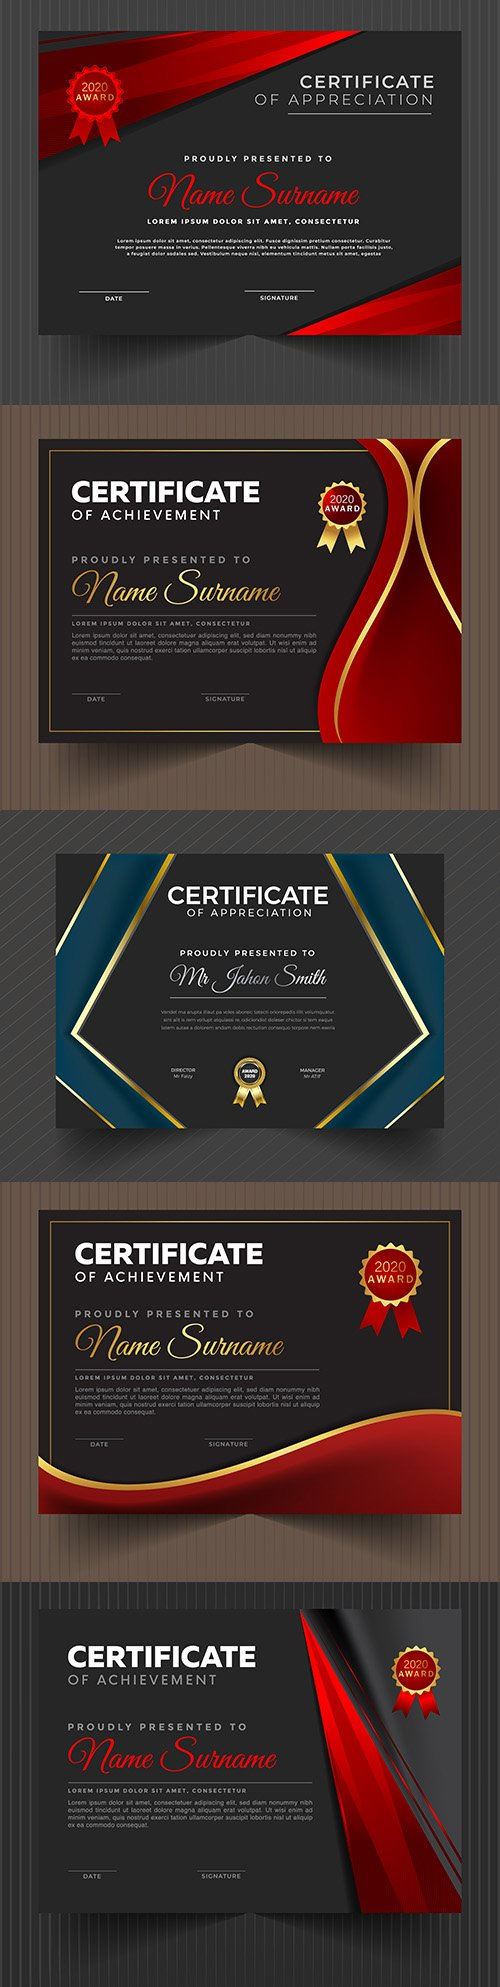 Certificate achievement template design collection 3